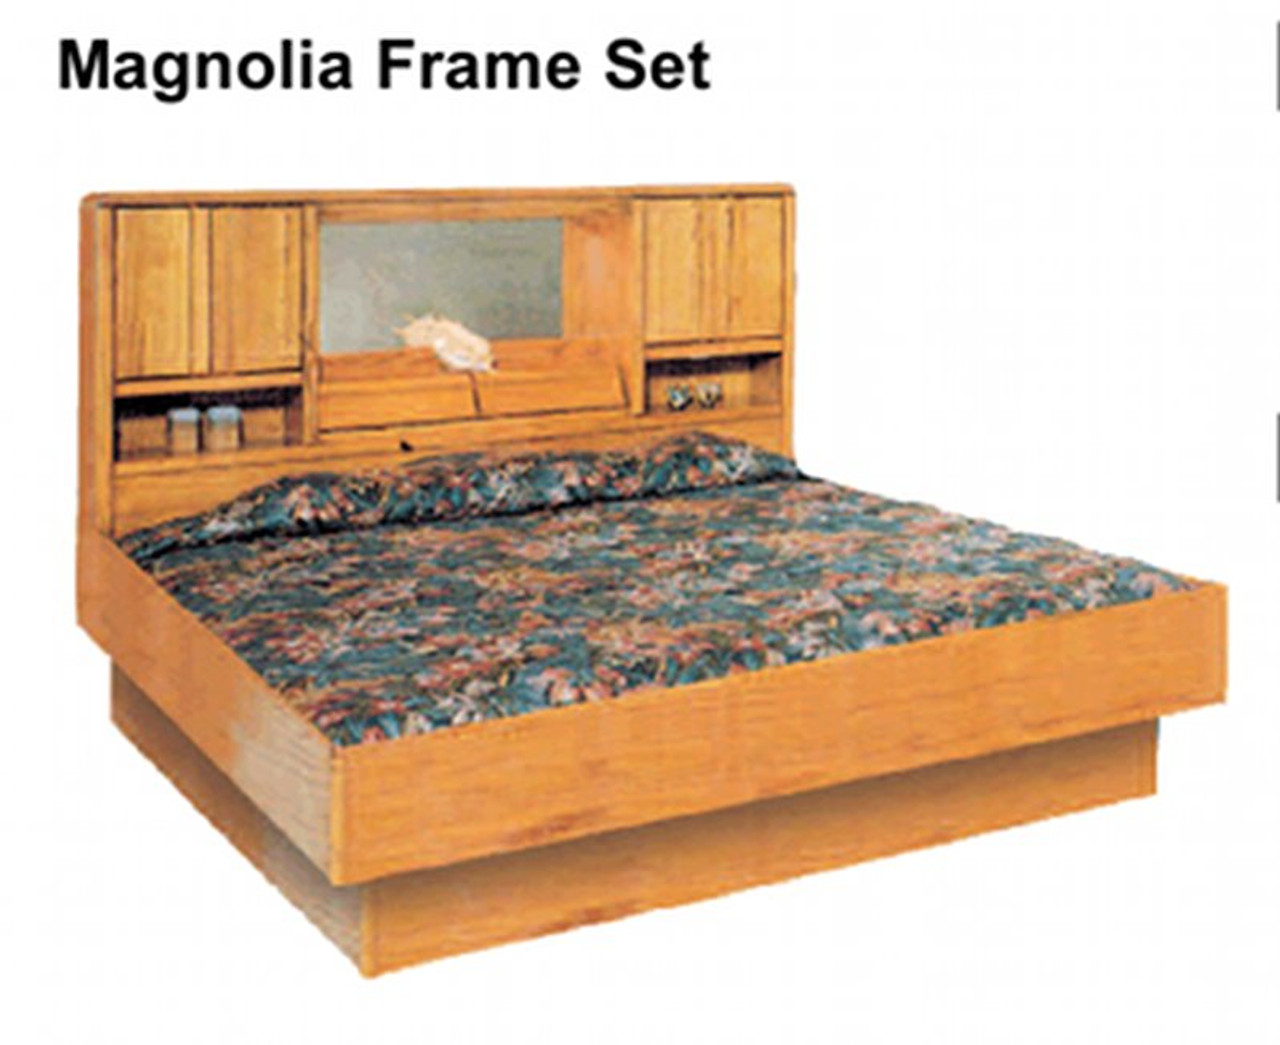 La Jolla Magnolia Oak Waterbed Frame. Oak Bedroom furniture